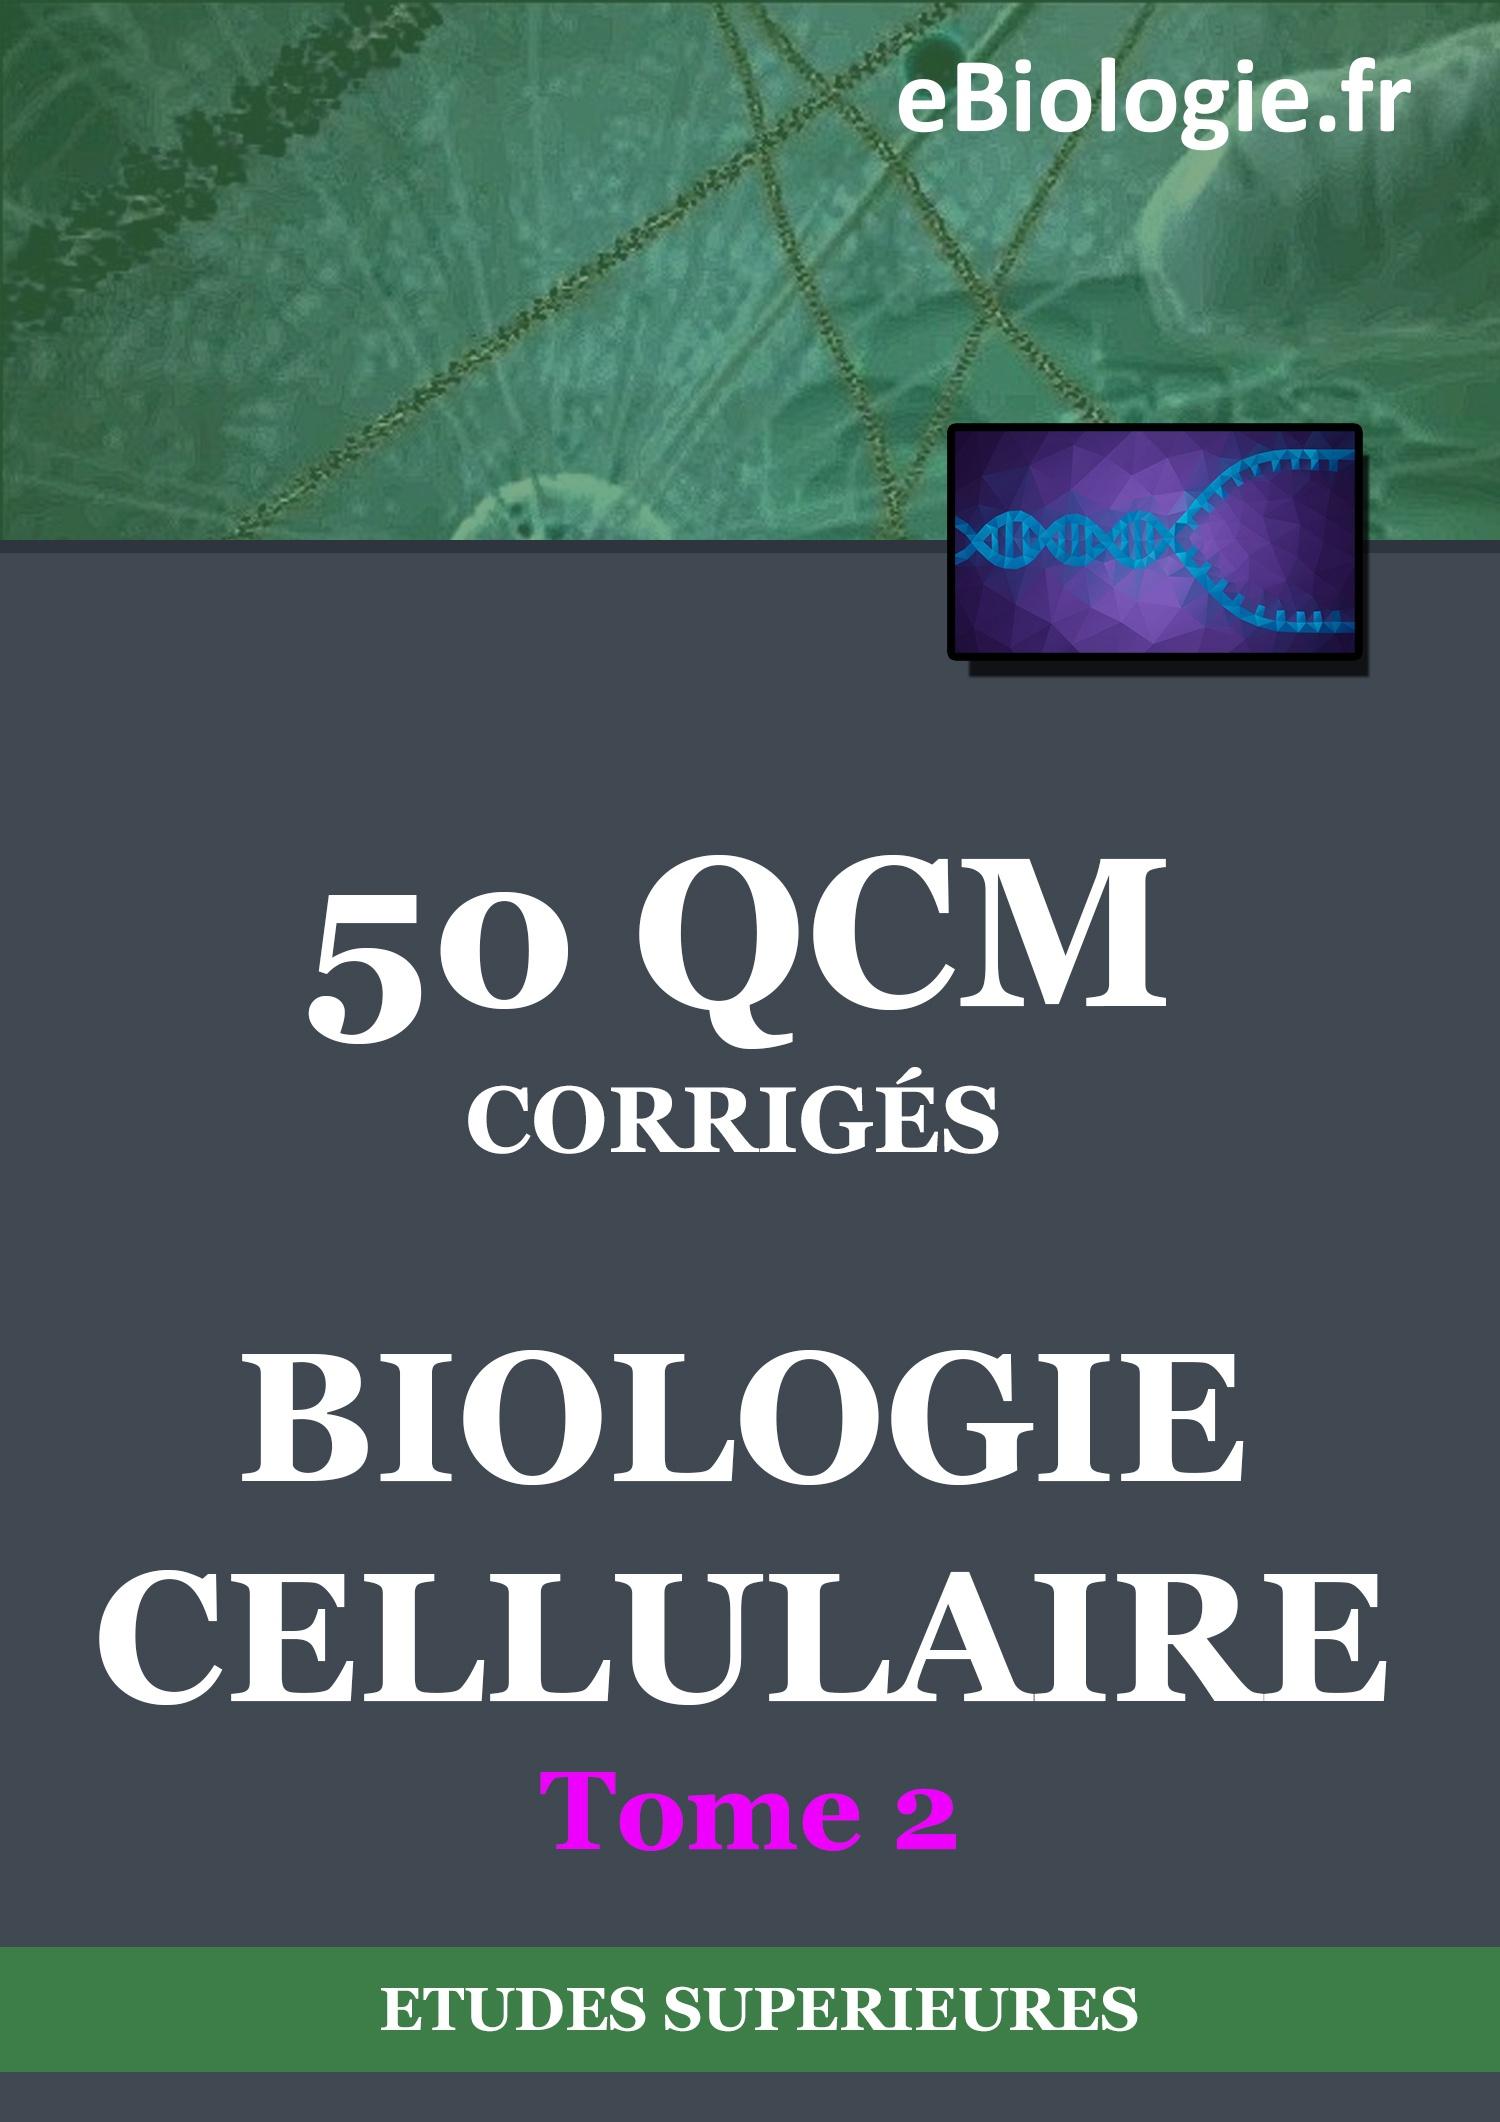 Ebook : eBook 50 QCM de Biologie cellulaire - Tome 2